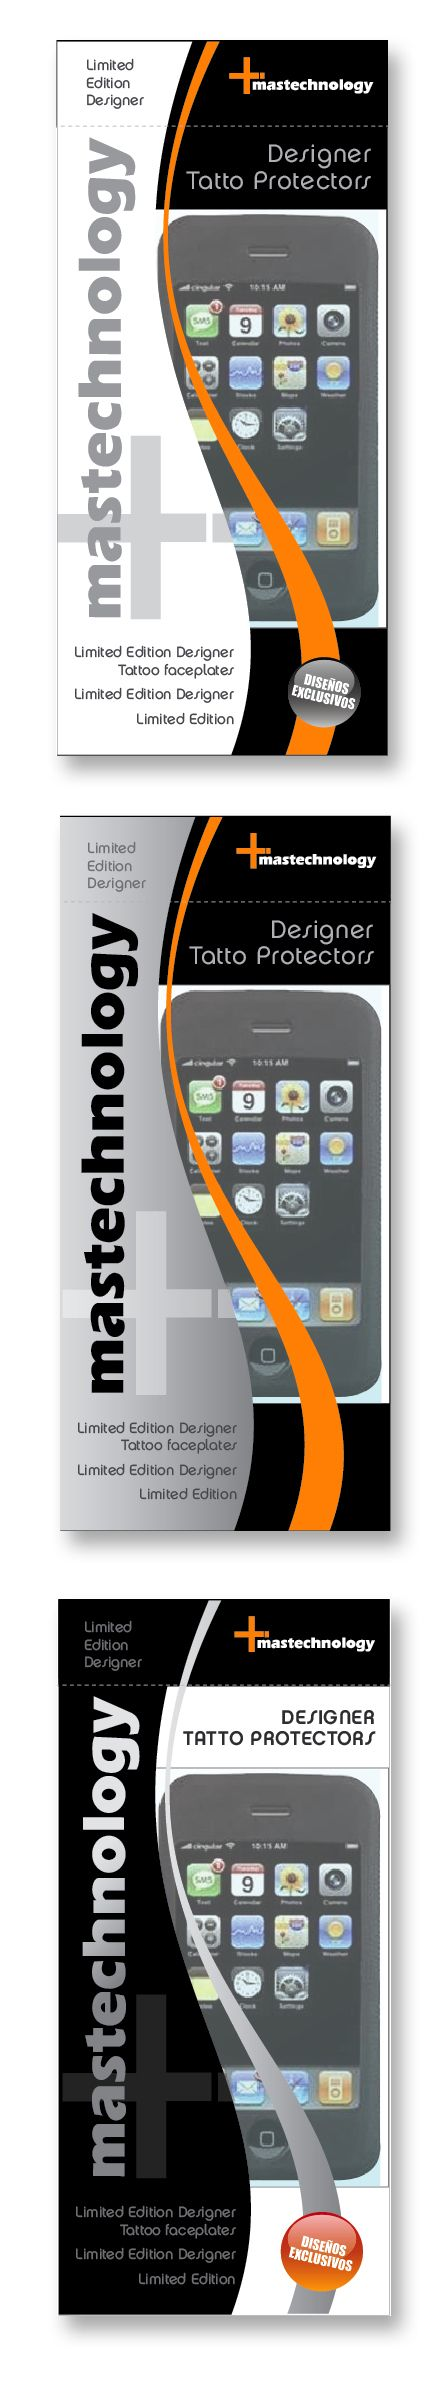 Diseño de cajas accesorios celulares Mastechology